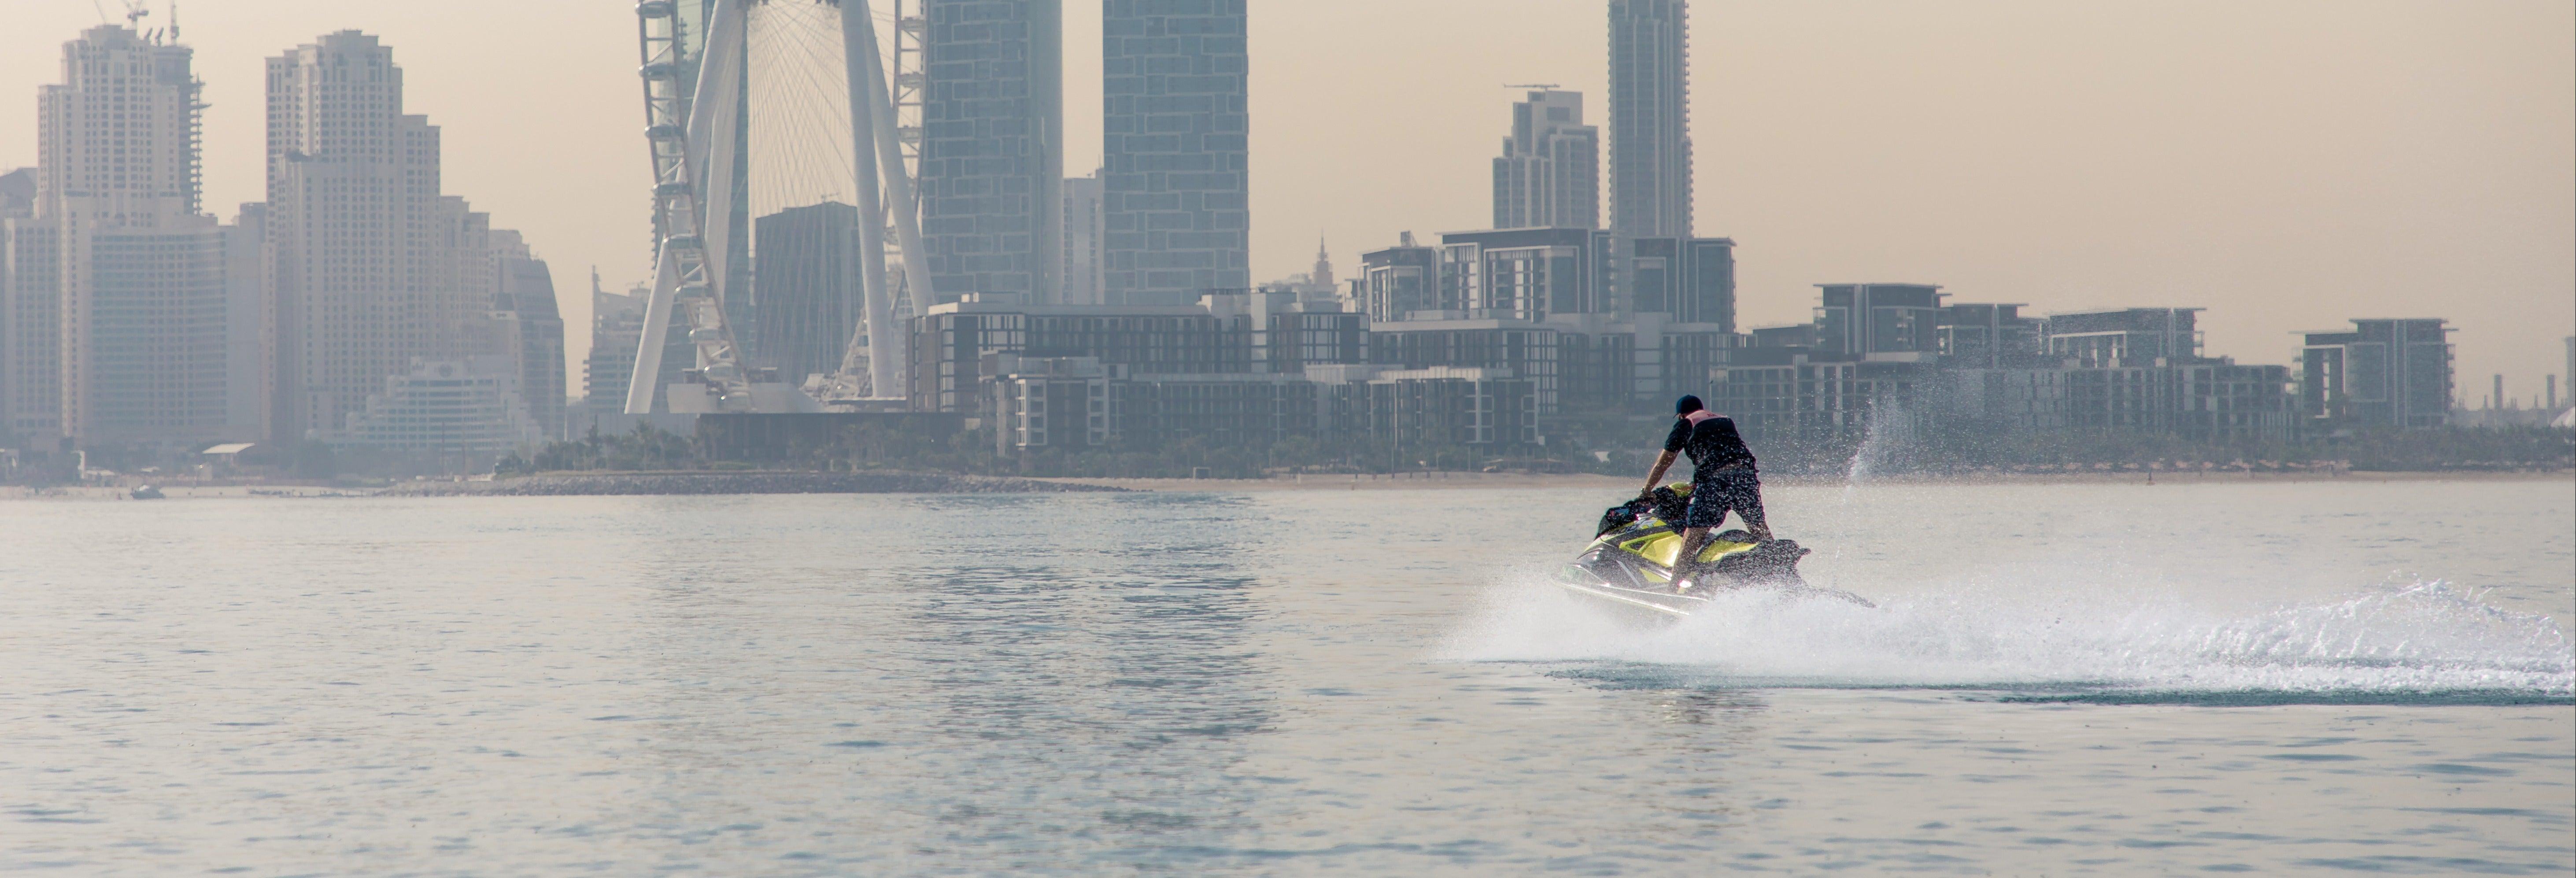 Balade en jet-ski à Dubaï